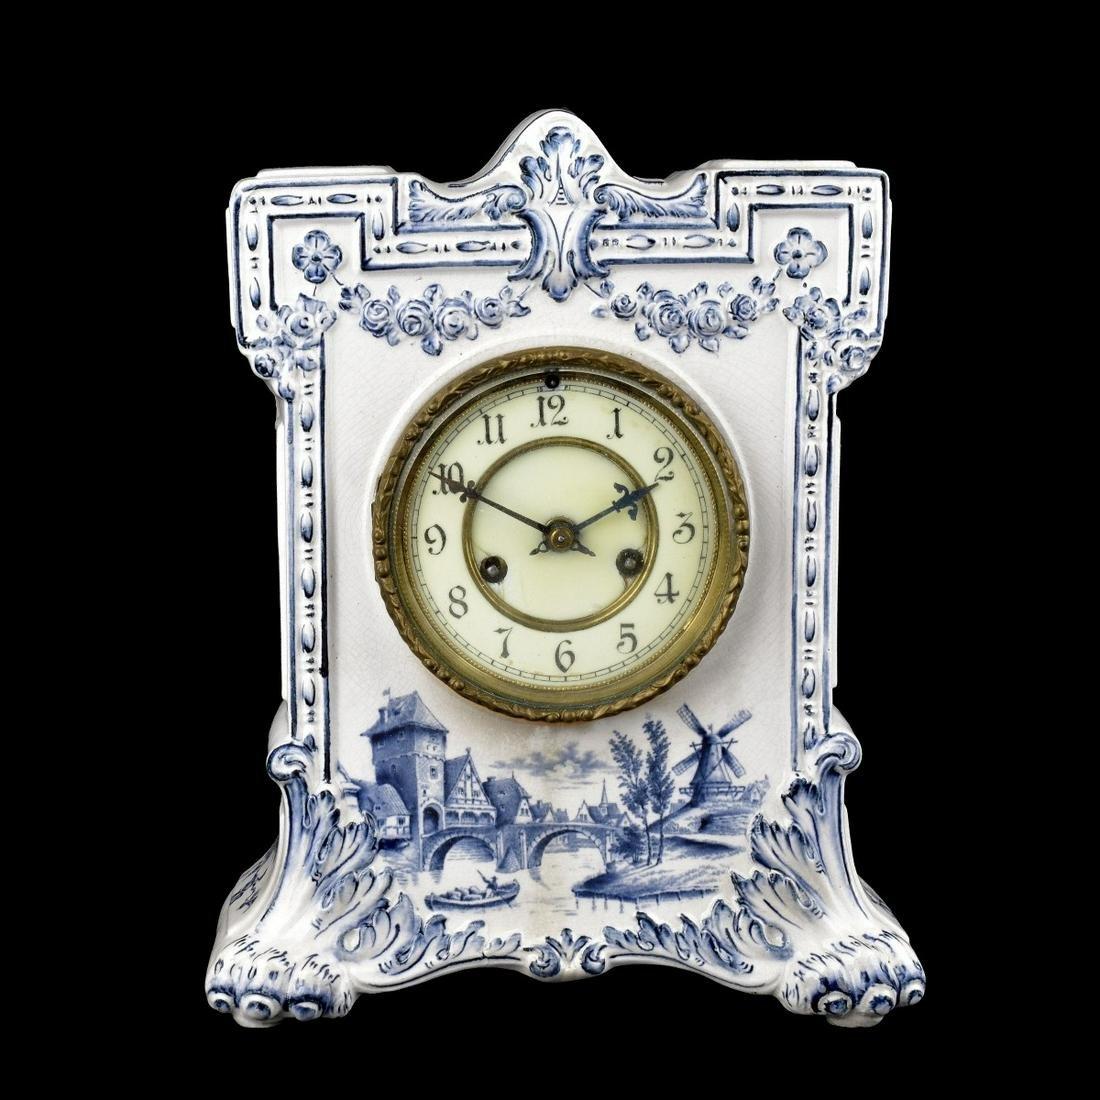 Waterbury Clock Co. Porcelain Clock